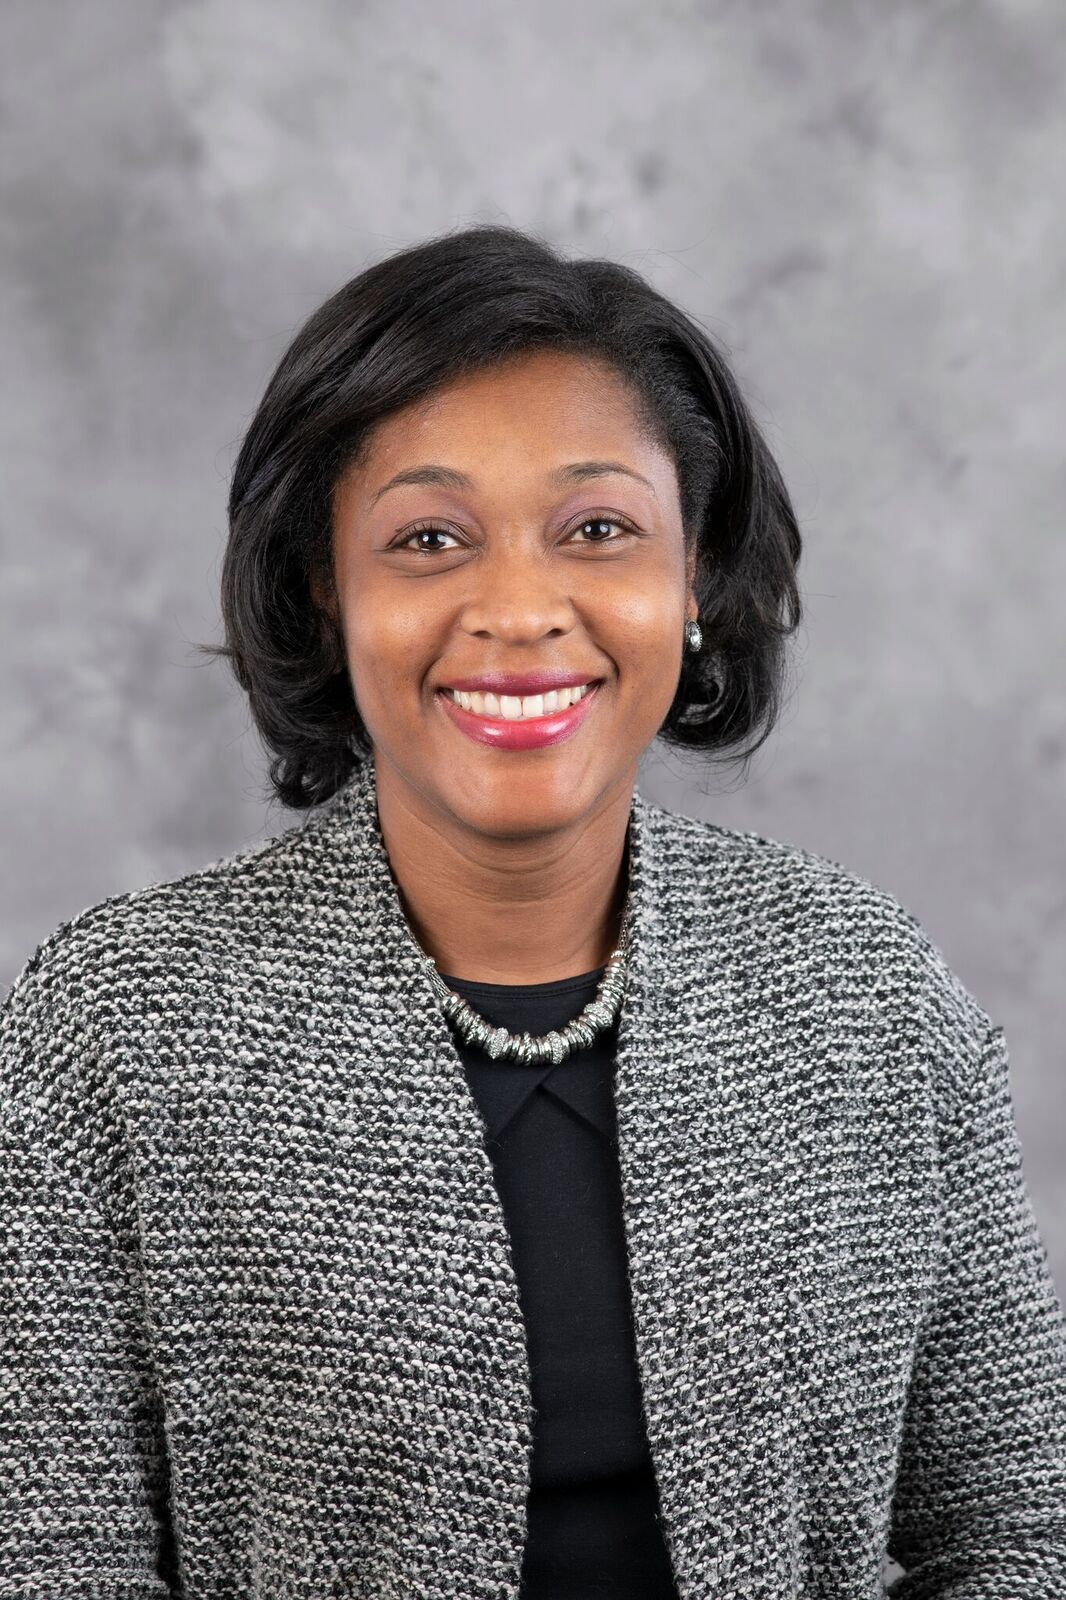 Headshot of Dr. Stephanie Dance-Barnes